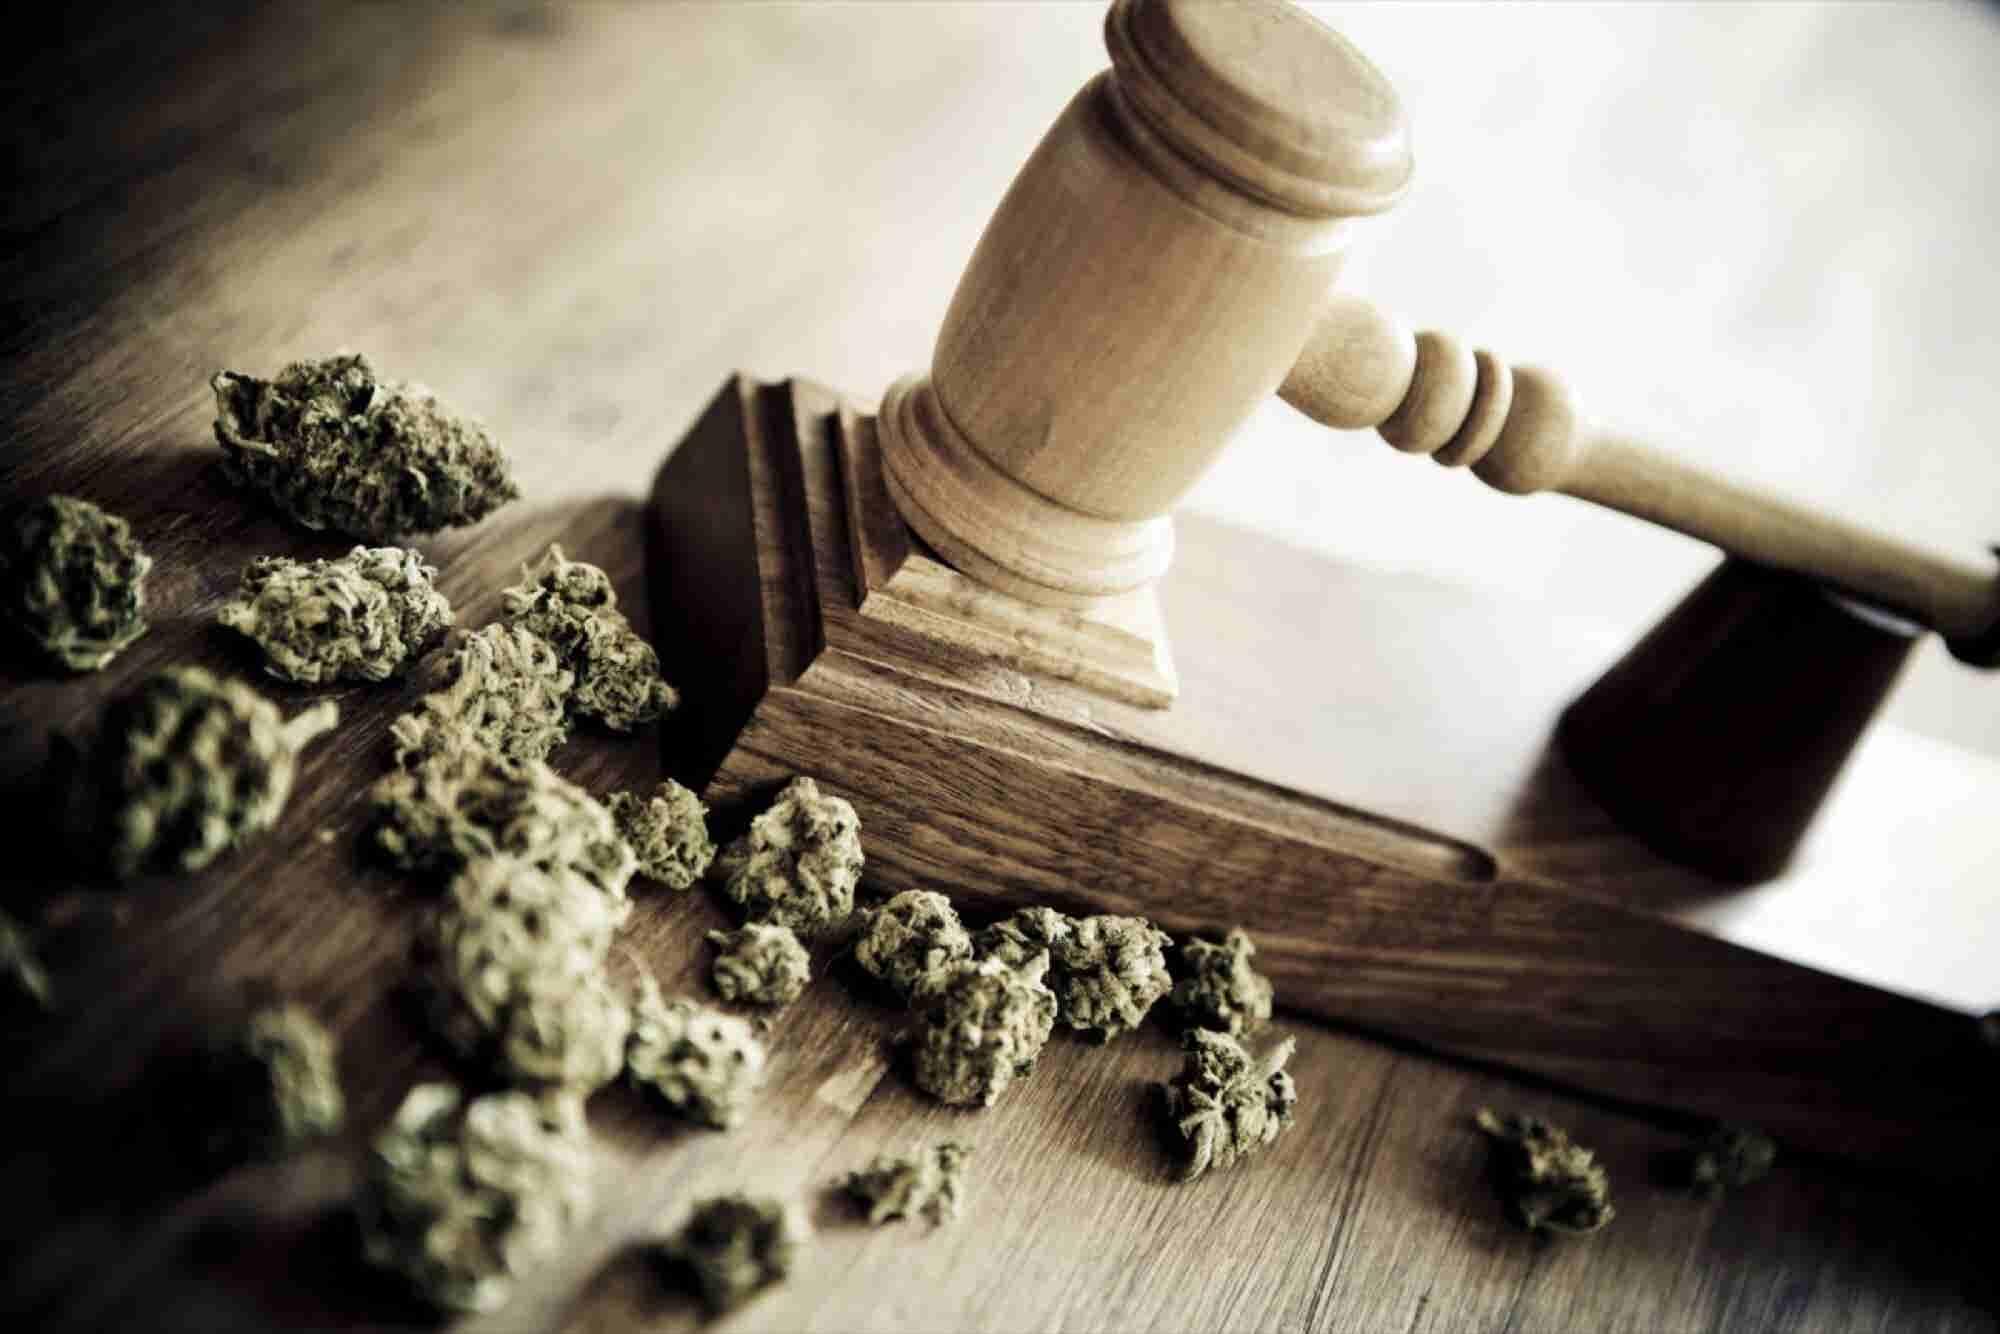 Marijuana In the Midwest? Nebraska Lawmakers Consider Cannabis Legalization.